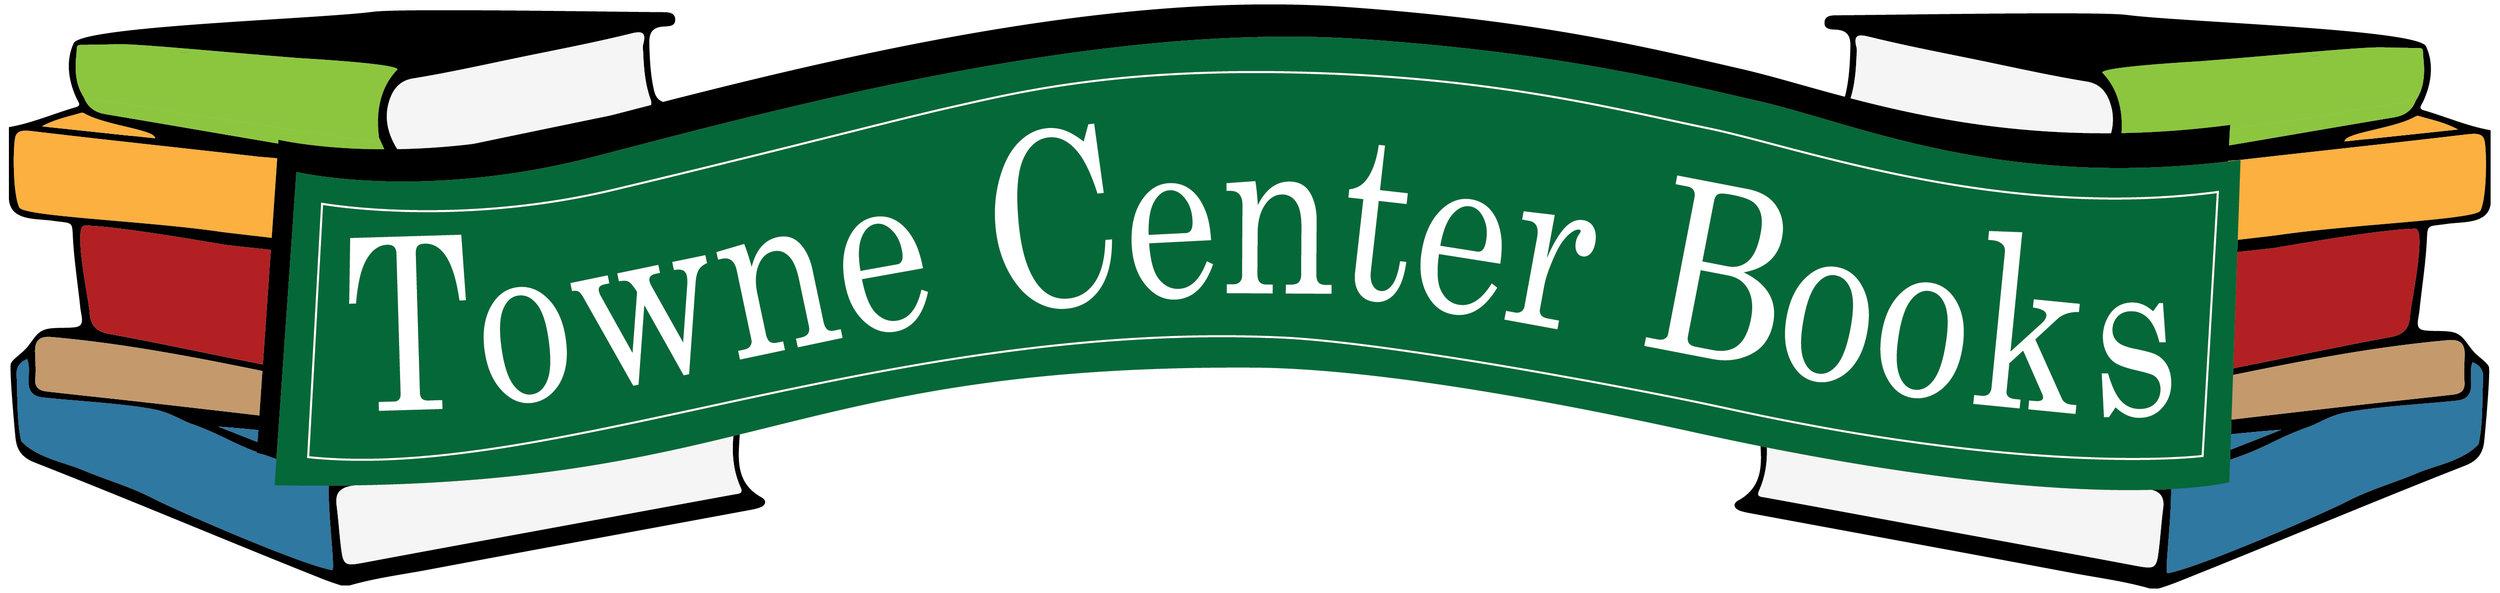 towne center logo plain.jpg